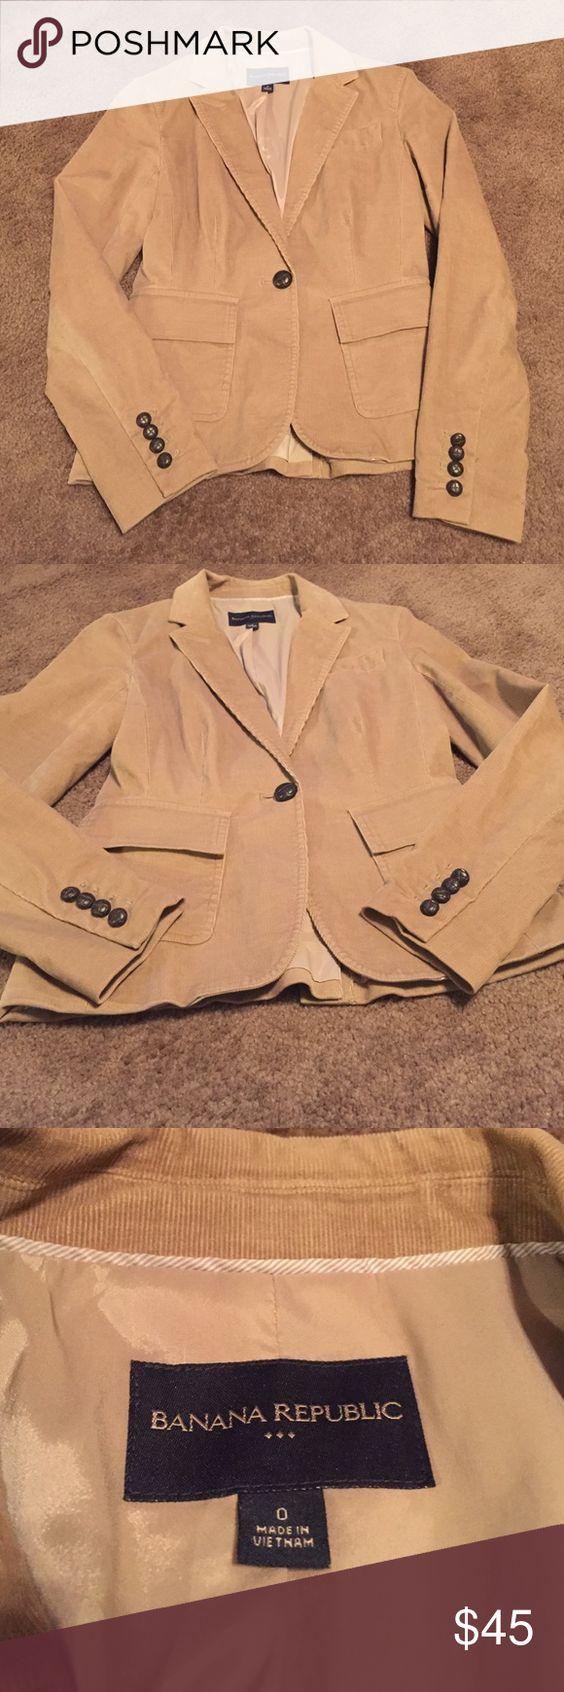 Banana Republic Tan Corduroy Jacket size 0 Banana Republic Tan Corduroy Jacket size 0. Cute Jacket with brown buttons. Great jacket. Banana Republic Jackets & Coats Blazers